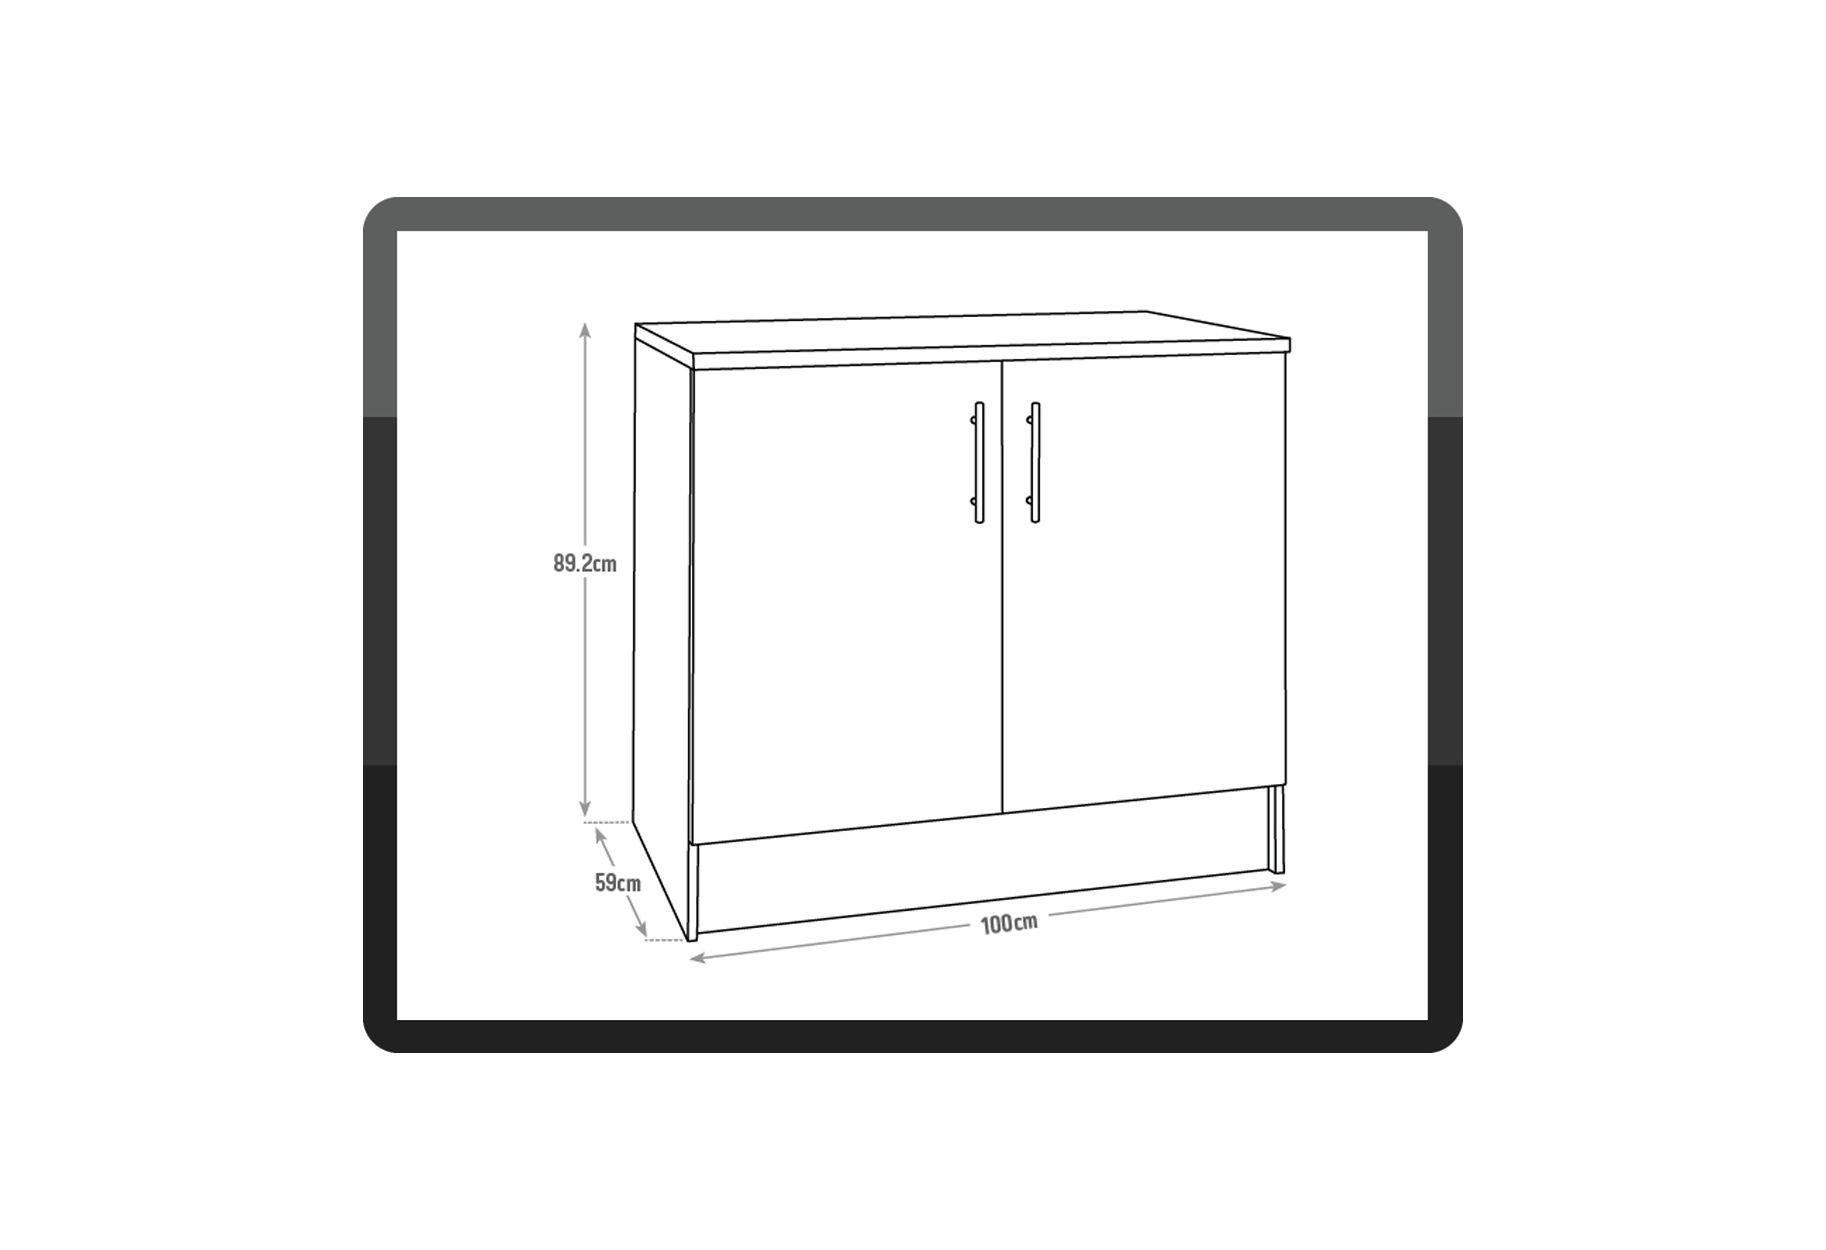 Sale on hygena athina 1000mm fitted kitchen base for Oak kitchen base units